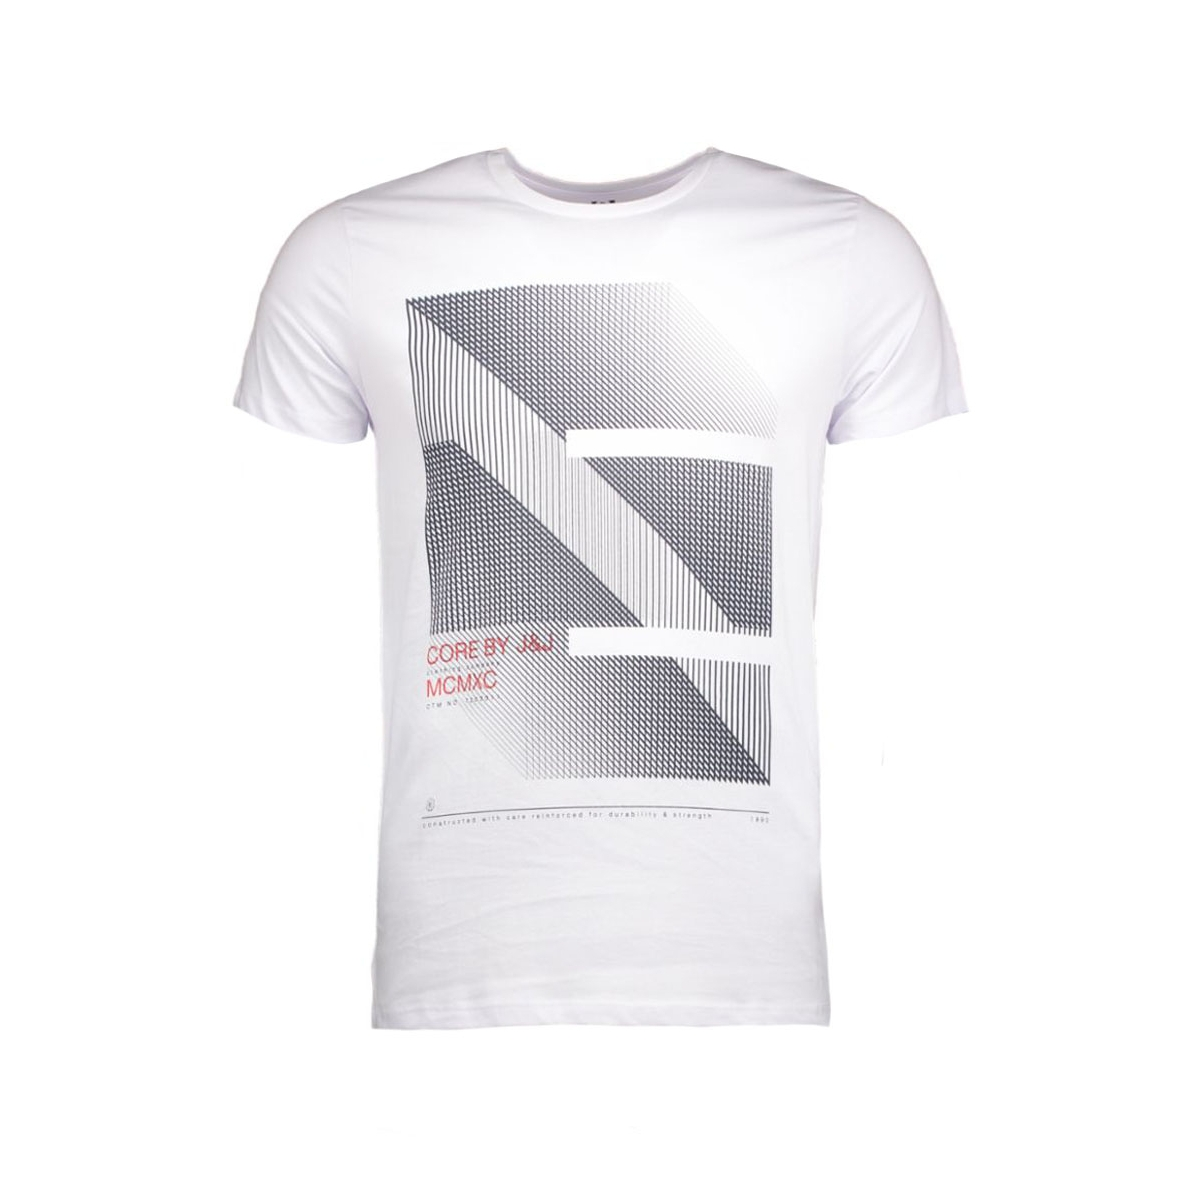 jcofloat-belkin tee ss o-neck camp 12108922 jack & jones t-shirt white/tall&slim grafische print